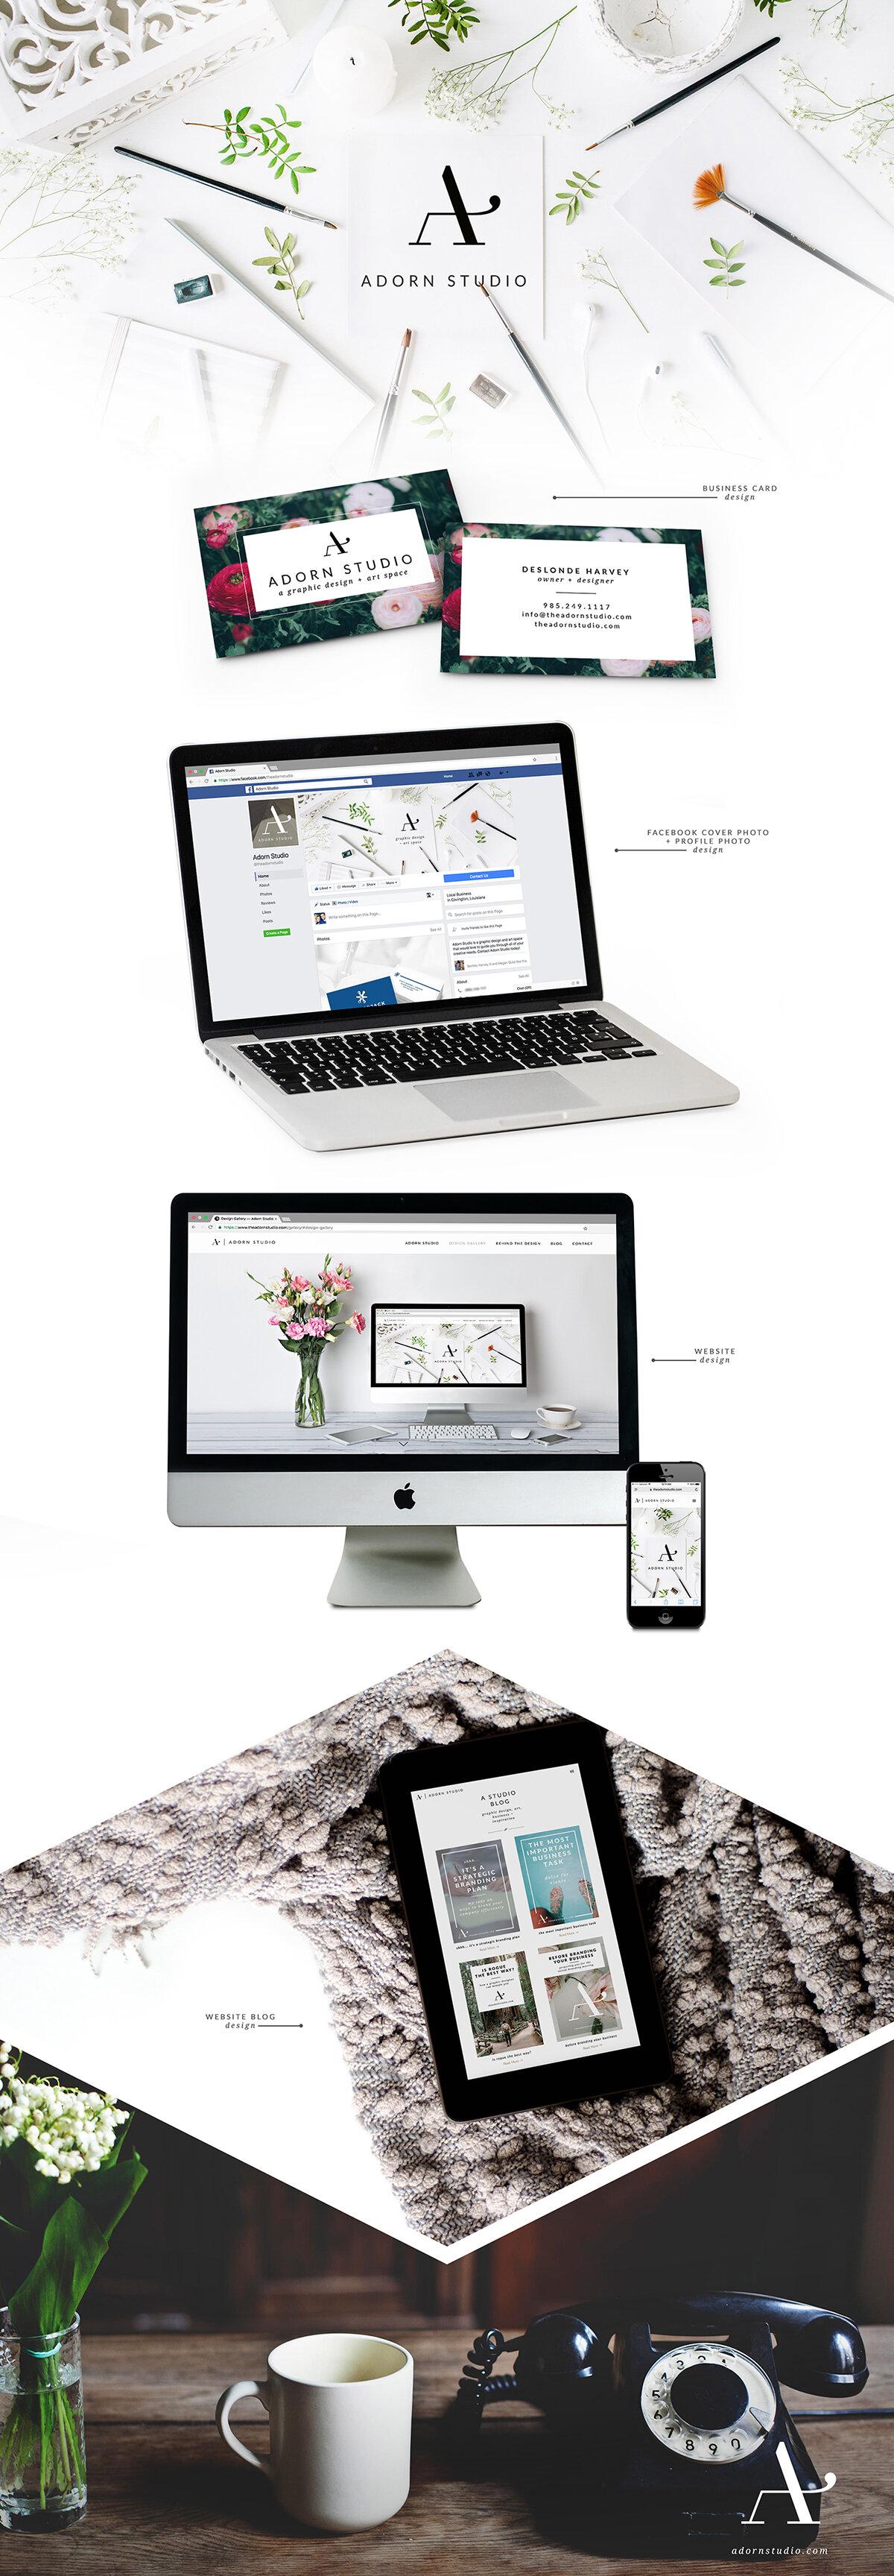 Adorn Studio | Innovative and Minimalist Graphic Design